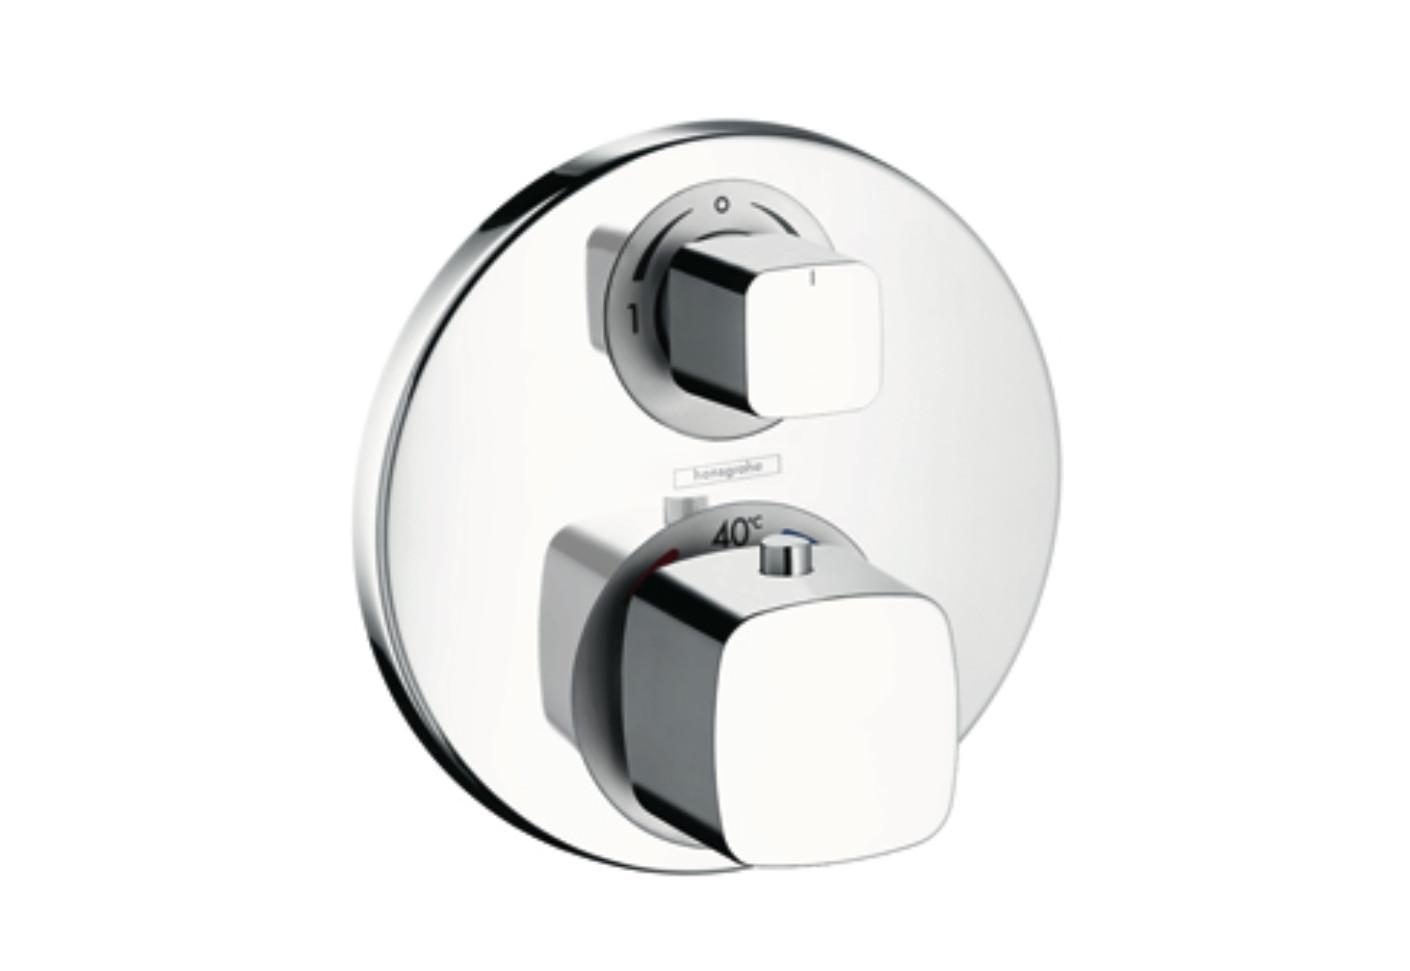 metris ecostat e thermostat unterputz mit ab. Black Bedroom Furniture Sets. Home Design Ideas